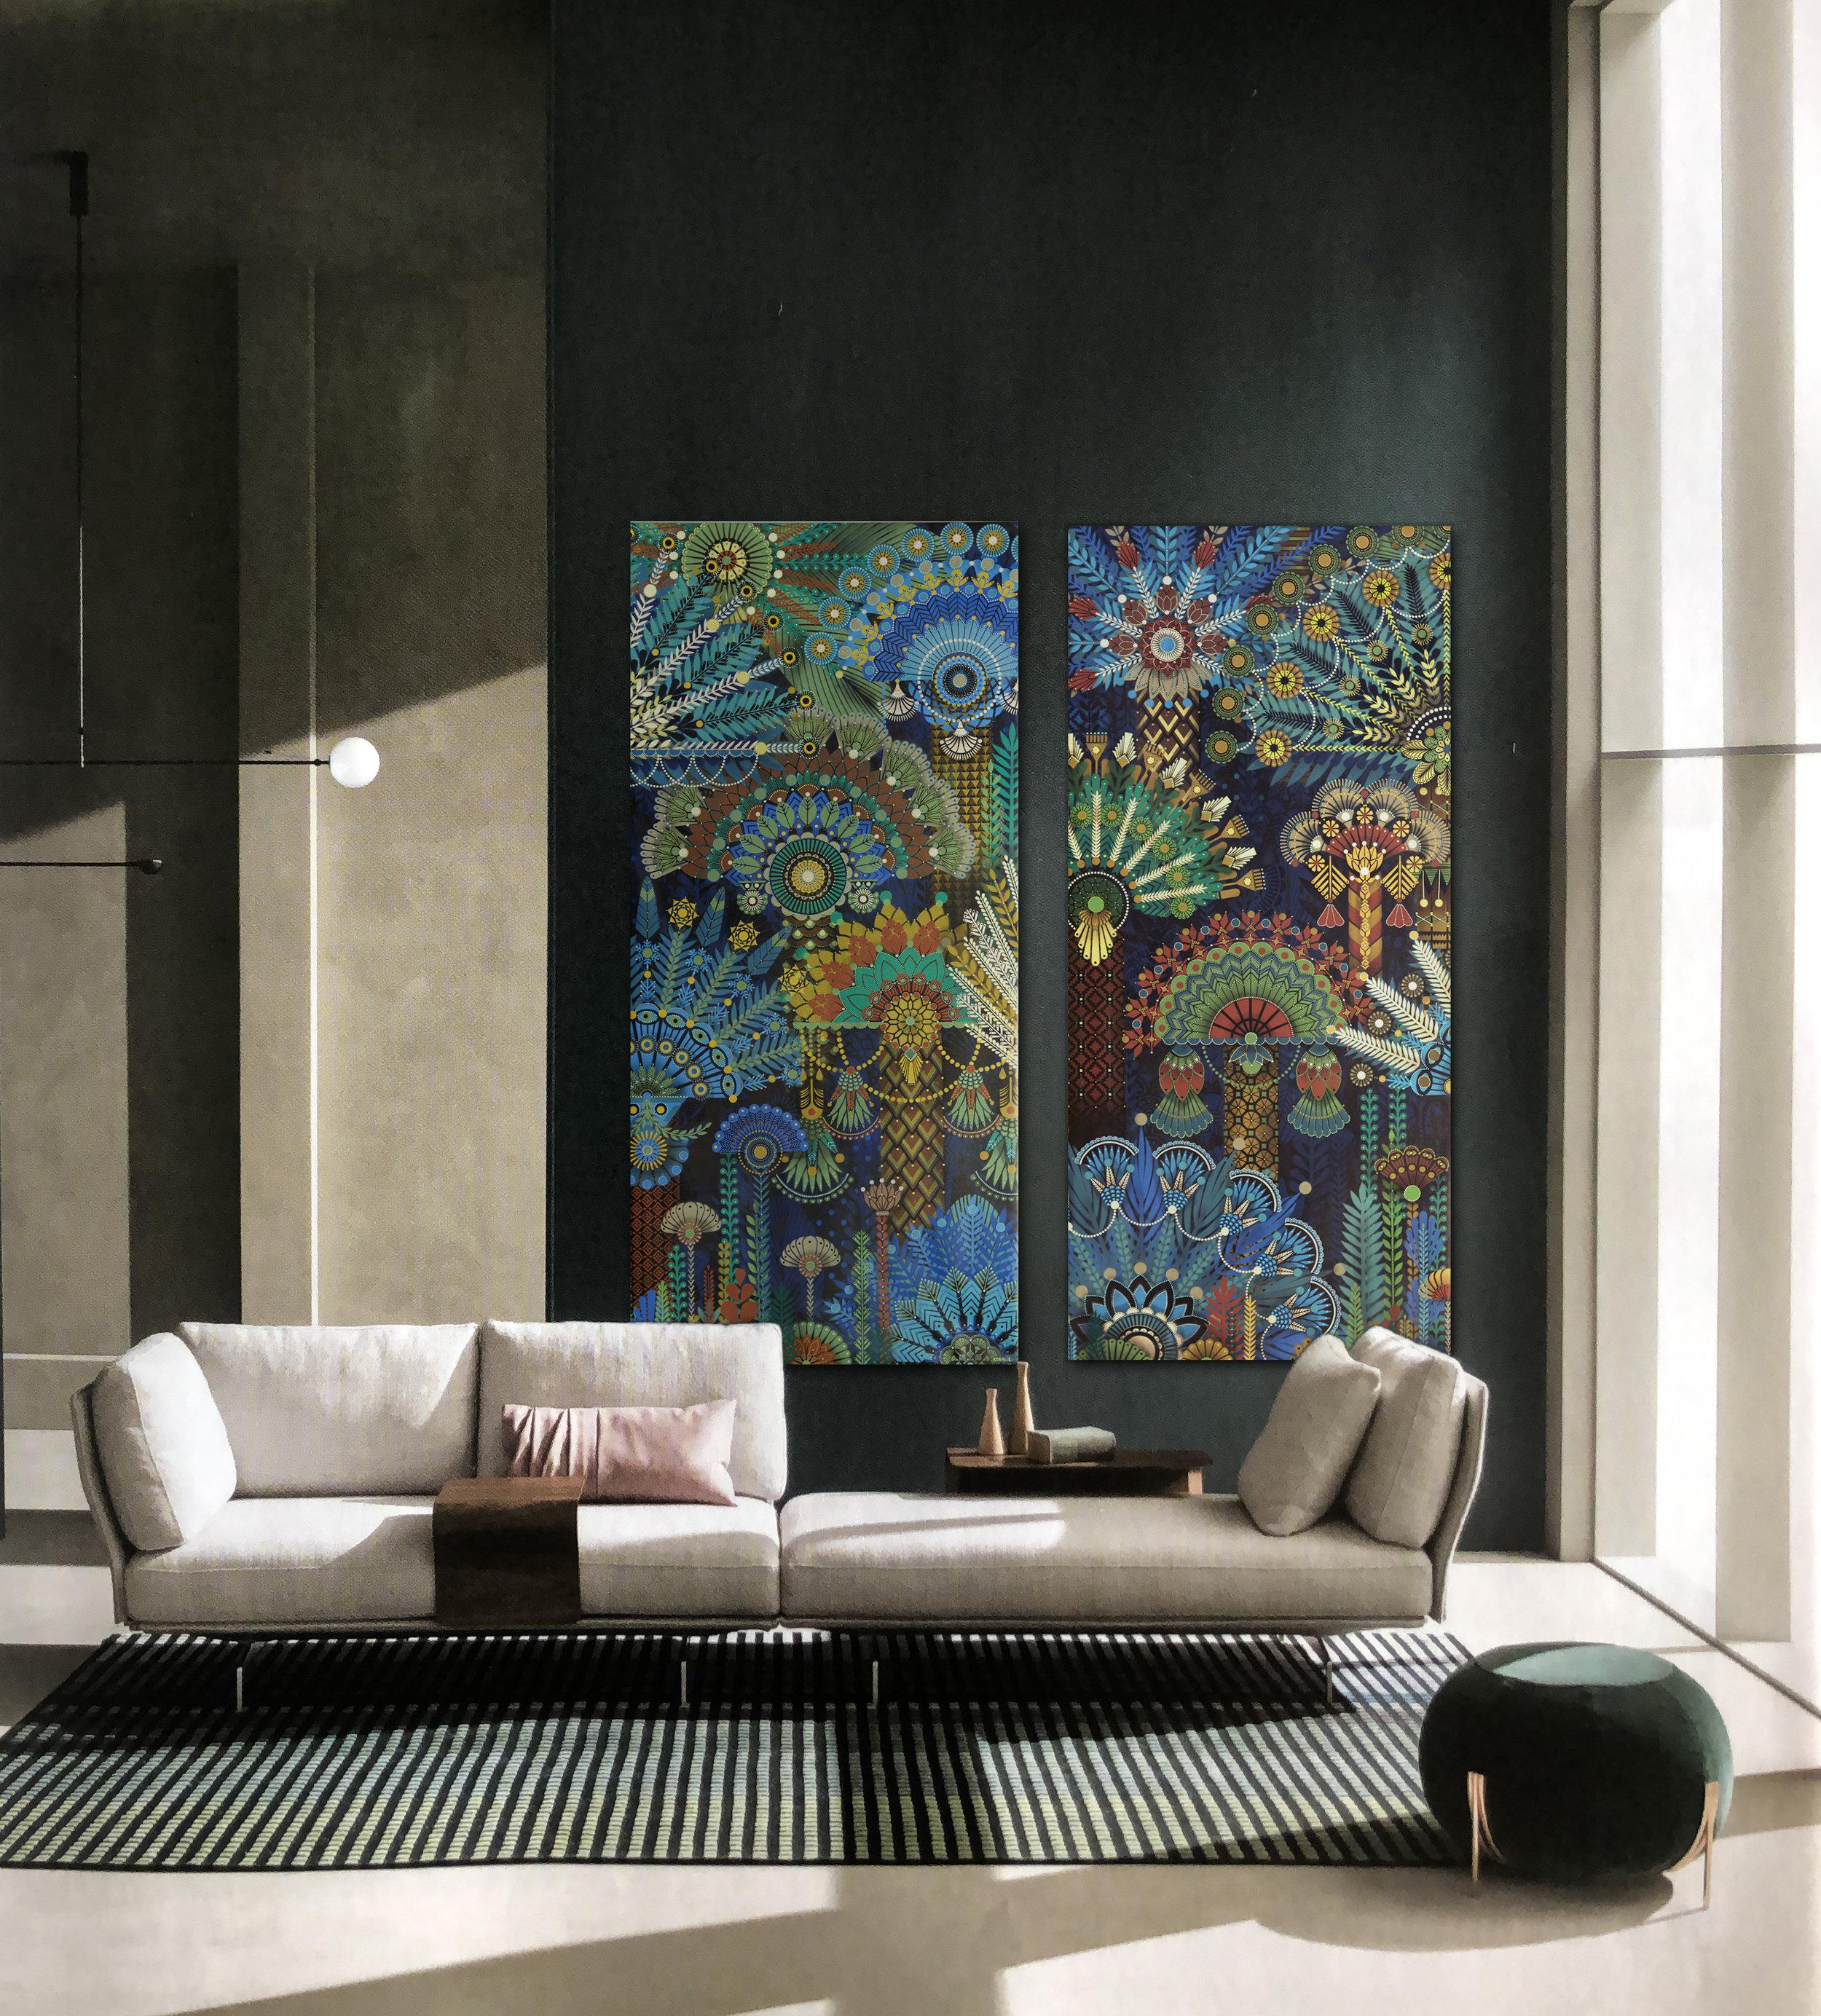 Palm Garden  - Acrylic on canvas, 214 x 100 cm | 2018 *  Photo-montage w/ IDEAT Magazine n°136 - P.47 | Pub SABA Italia  |  Contratticompagny